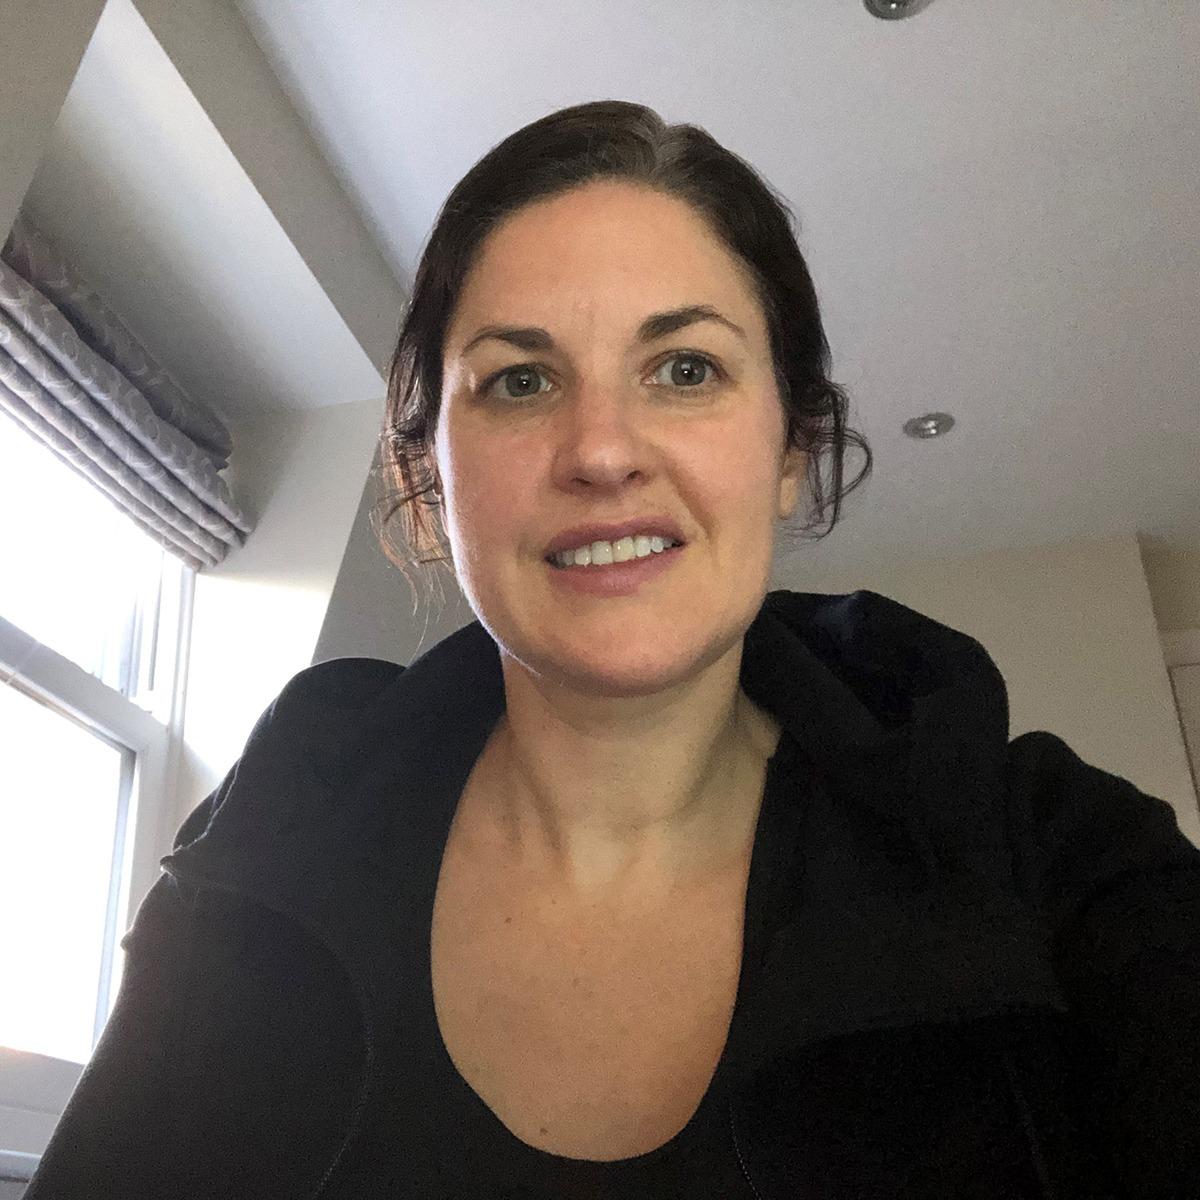 Aisling Zarraga